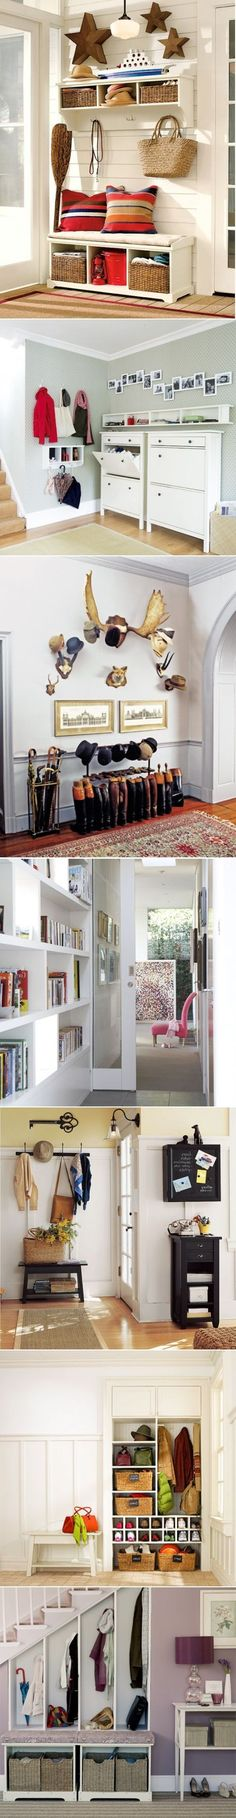 Creative Storage Idea For A Small Bathroom Organization 07 20 Practical And Decorative Bathroom Ideas